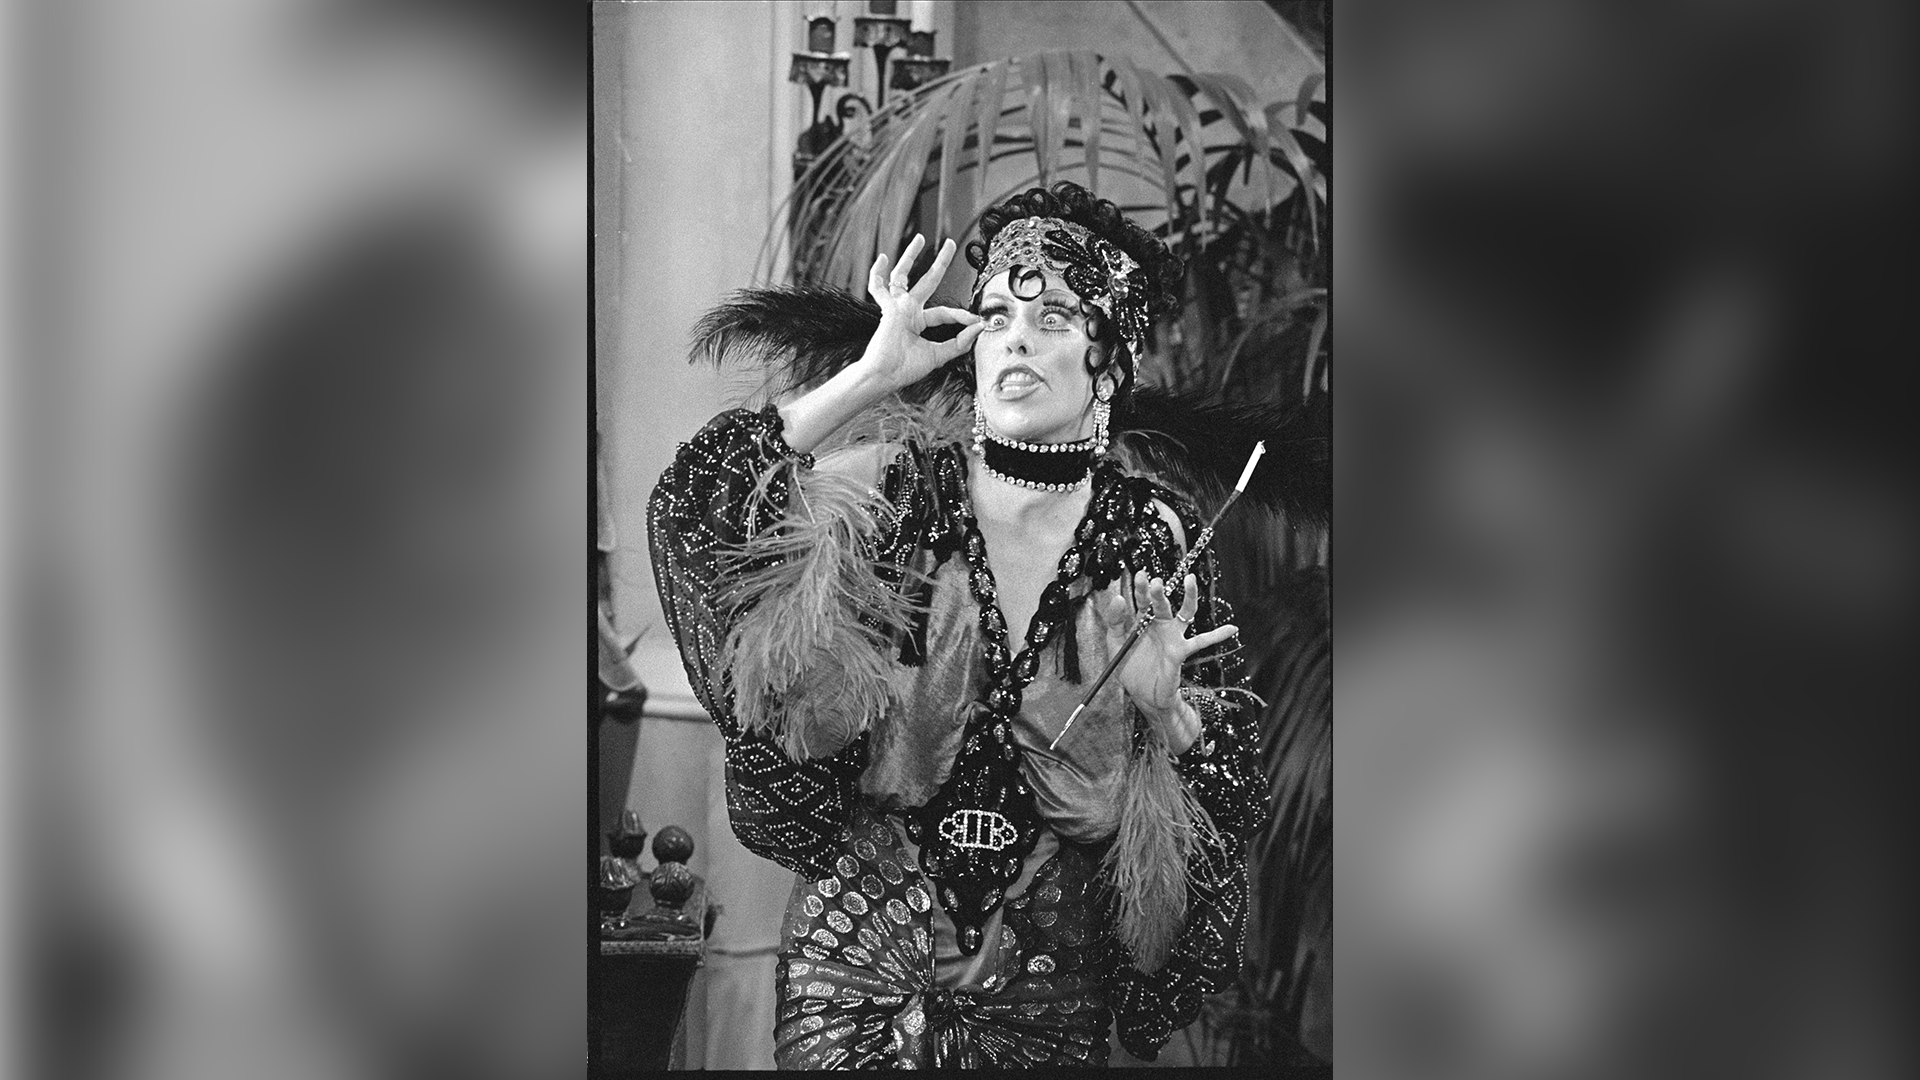 Carol Burnett playing silent film actress Nora Desmond.